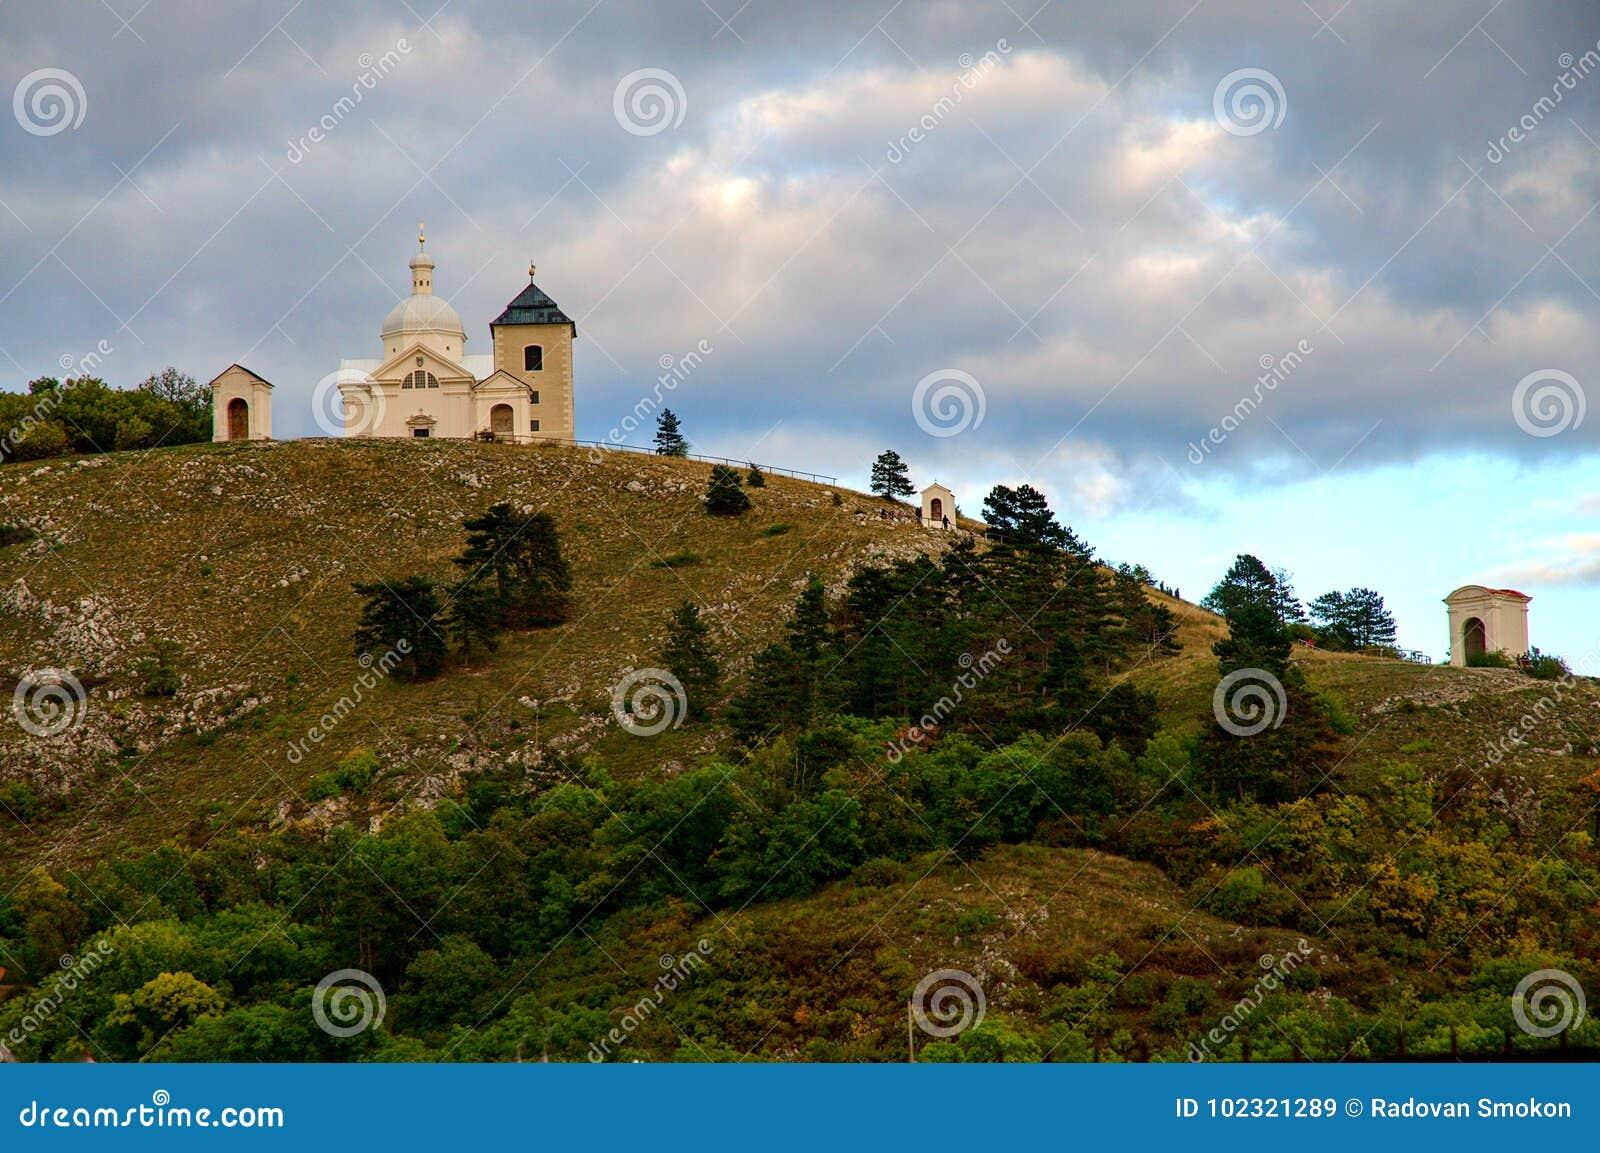 Mikulov - Holy Hill